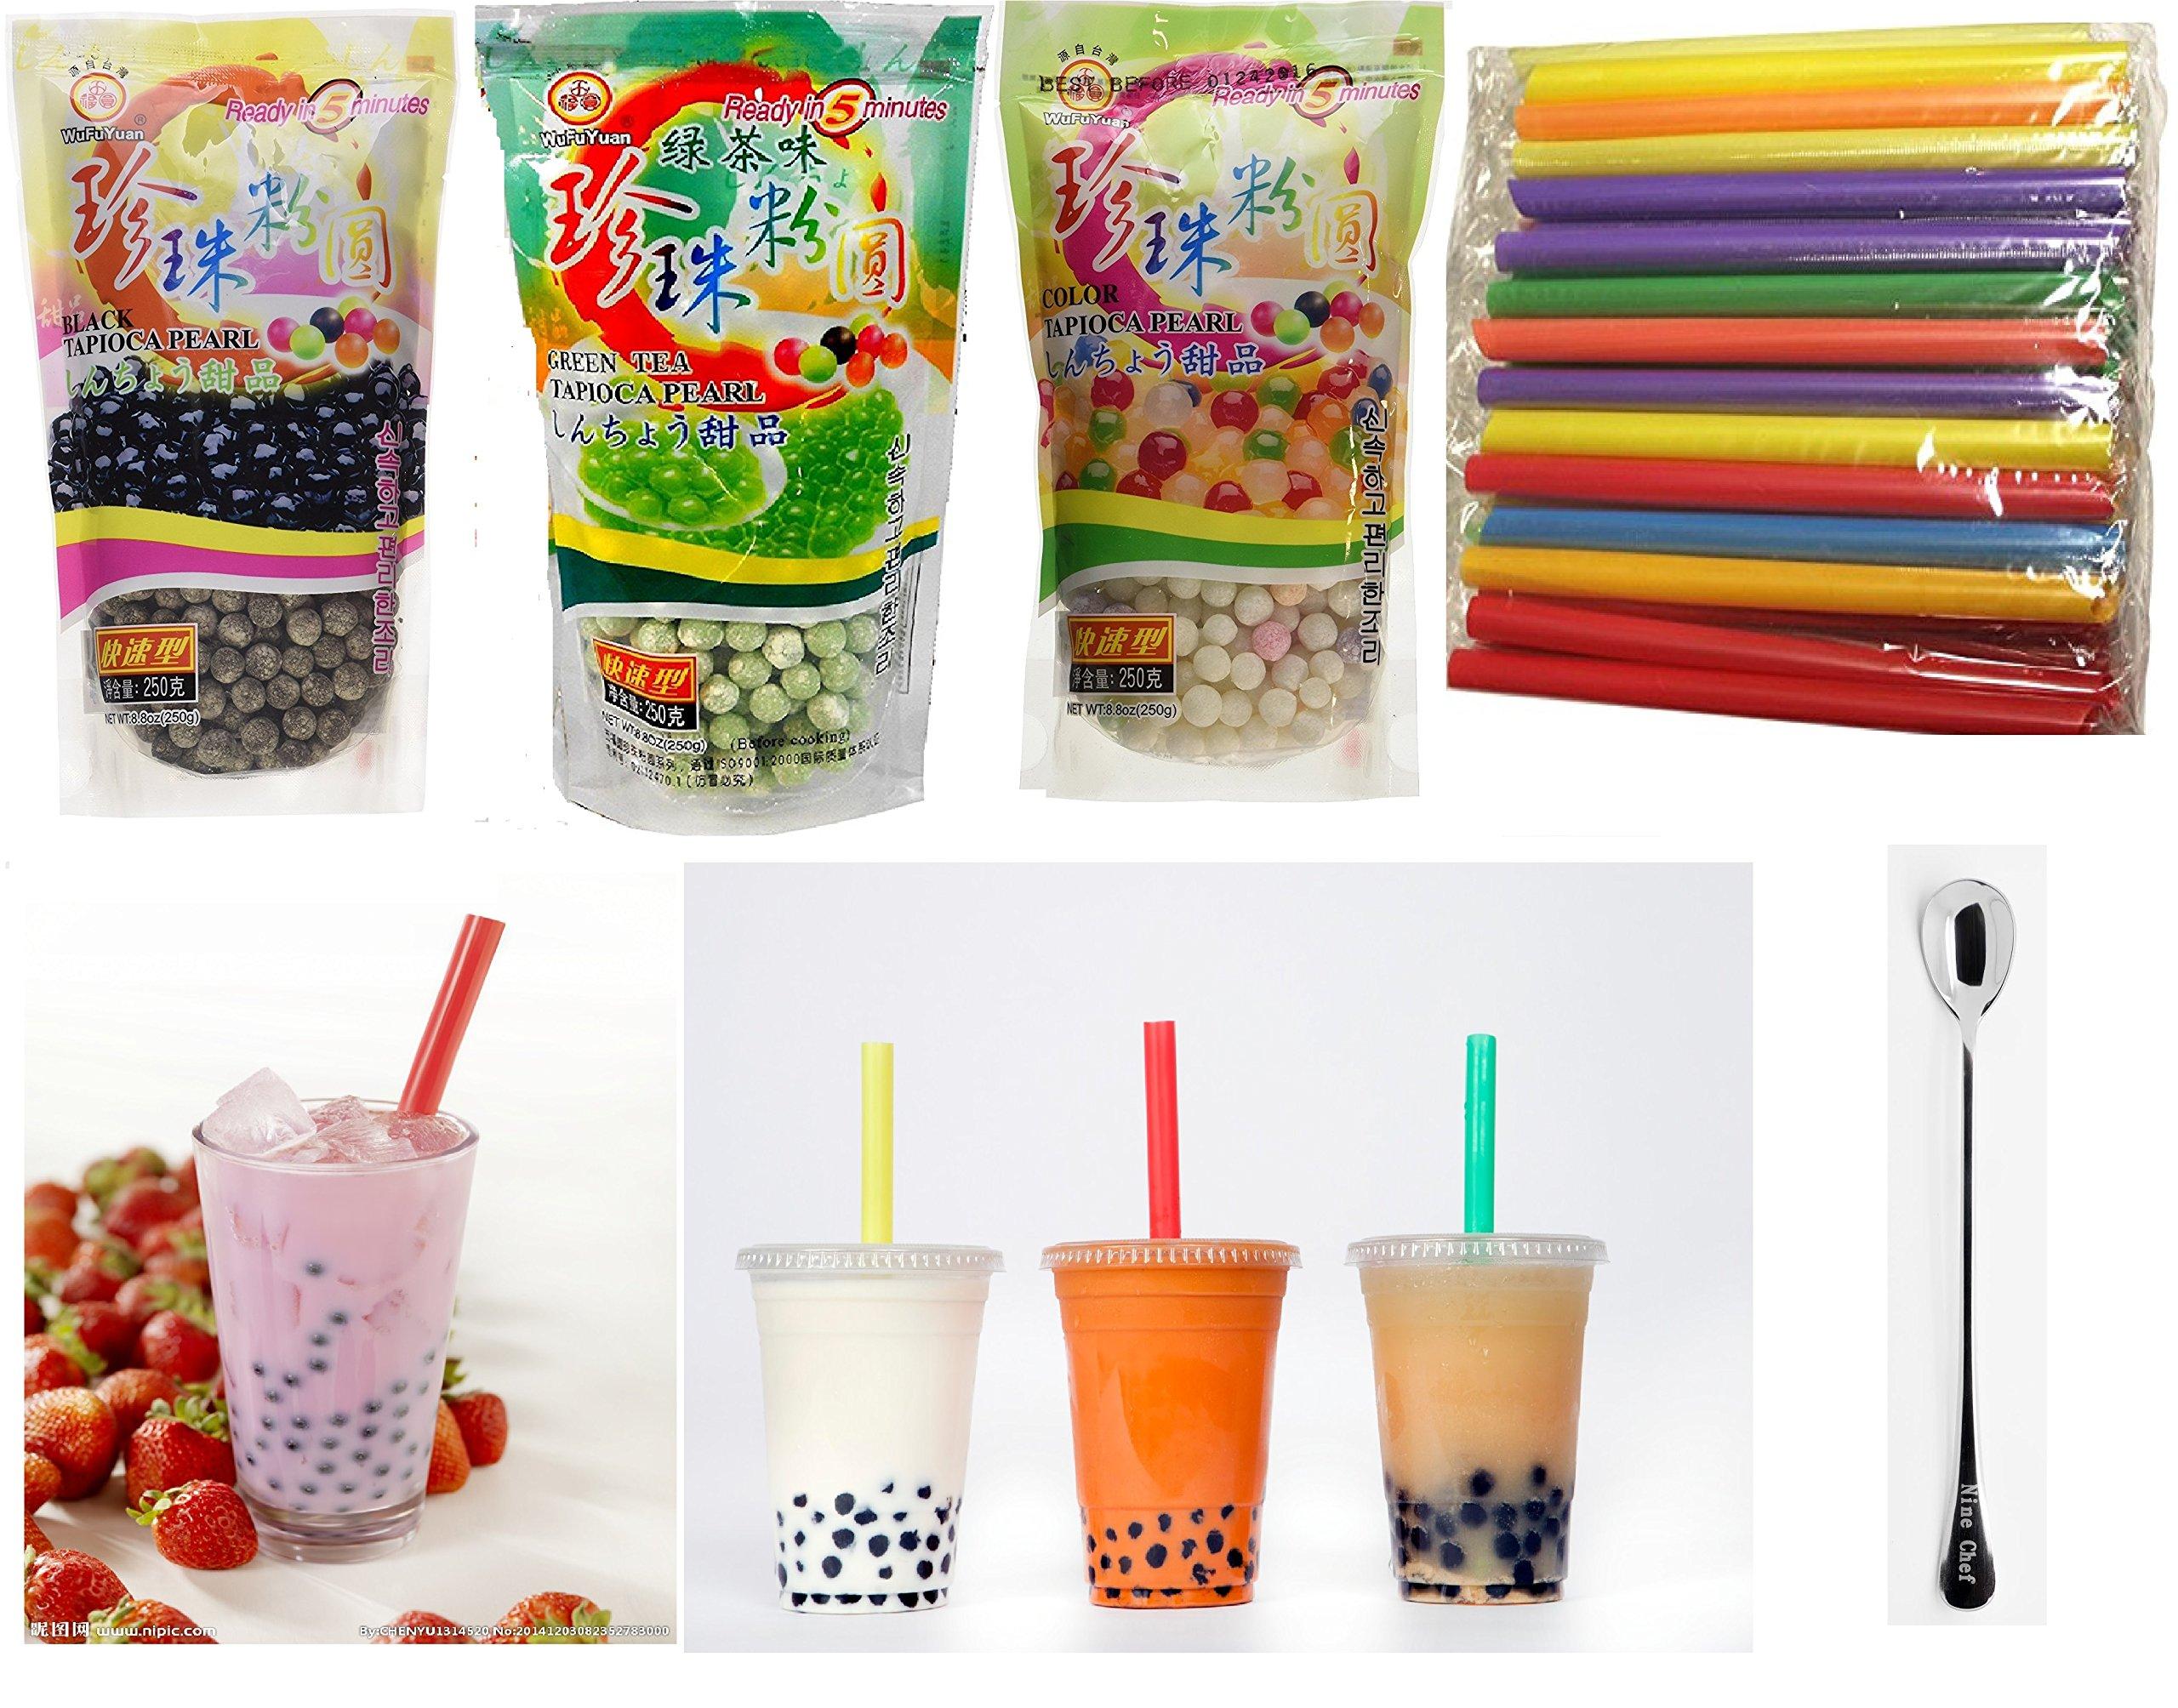 Wufuyuan - Tapioca Pearl (Black) - Net Wt. 8.8 Oz + multicolor pear + Green Tea Pearl + 50 Bubble Tea Straws + one ninechef Spoon Per order by NineChef